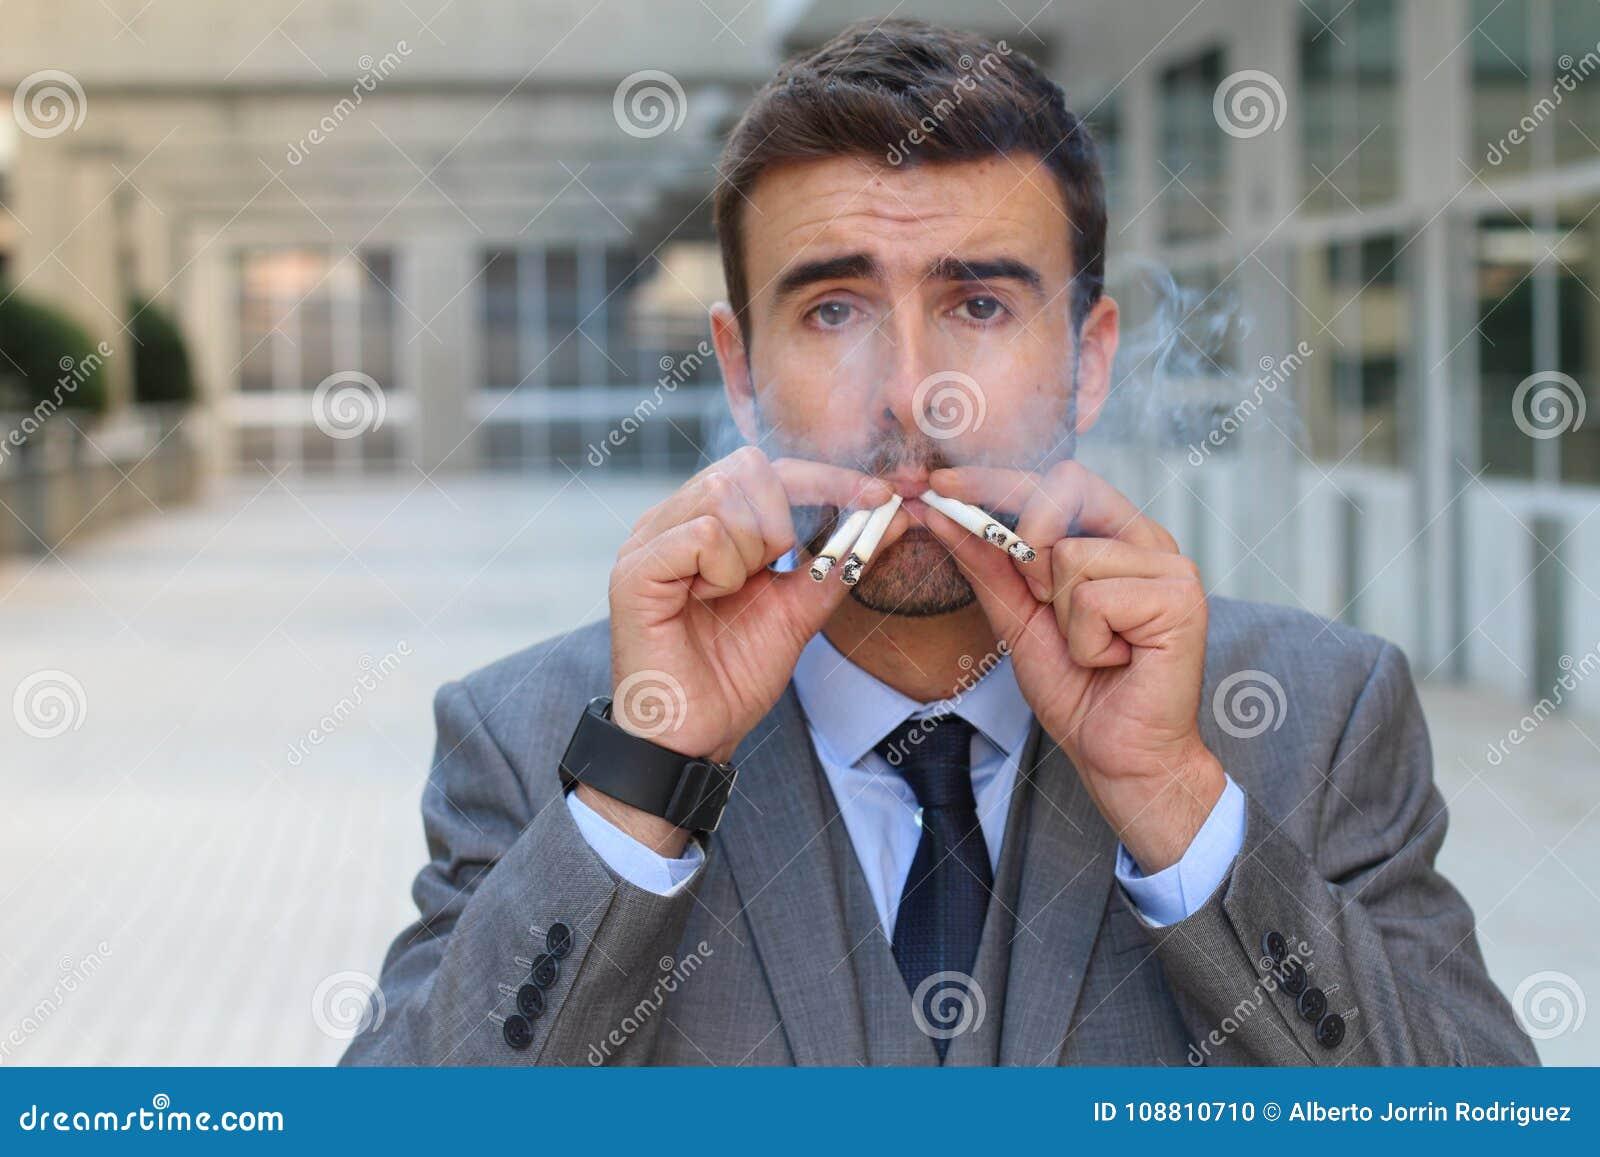 Homme compulsif avec une toxicomanie intense